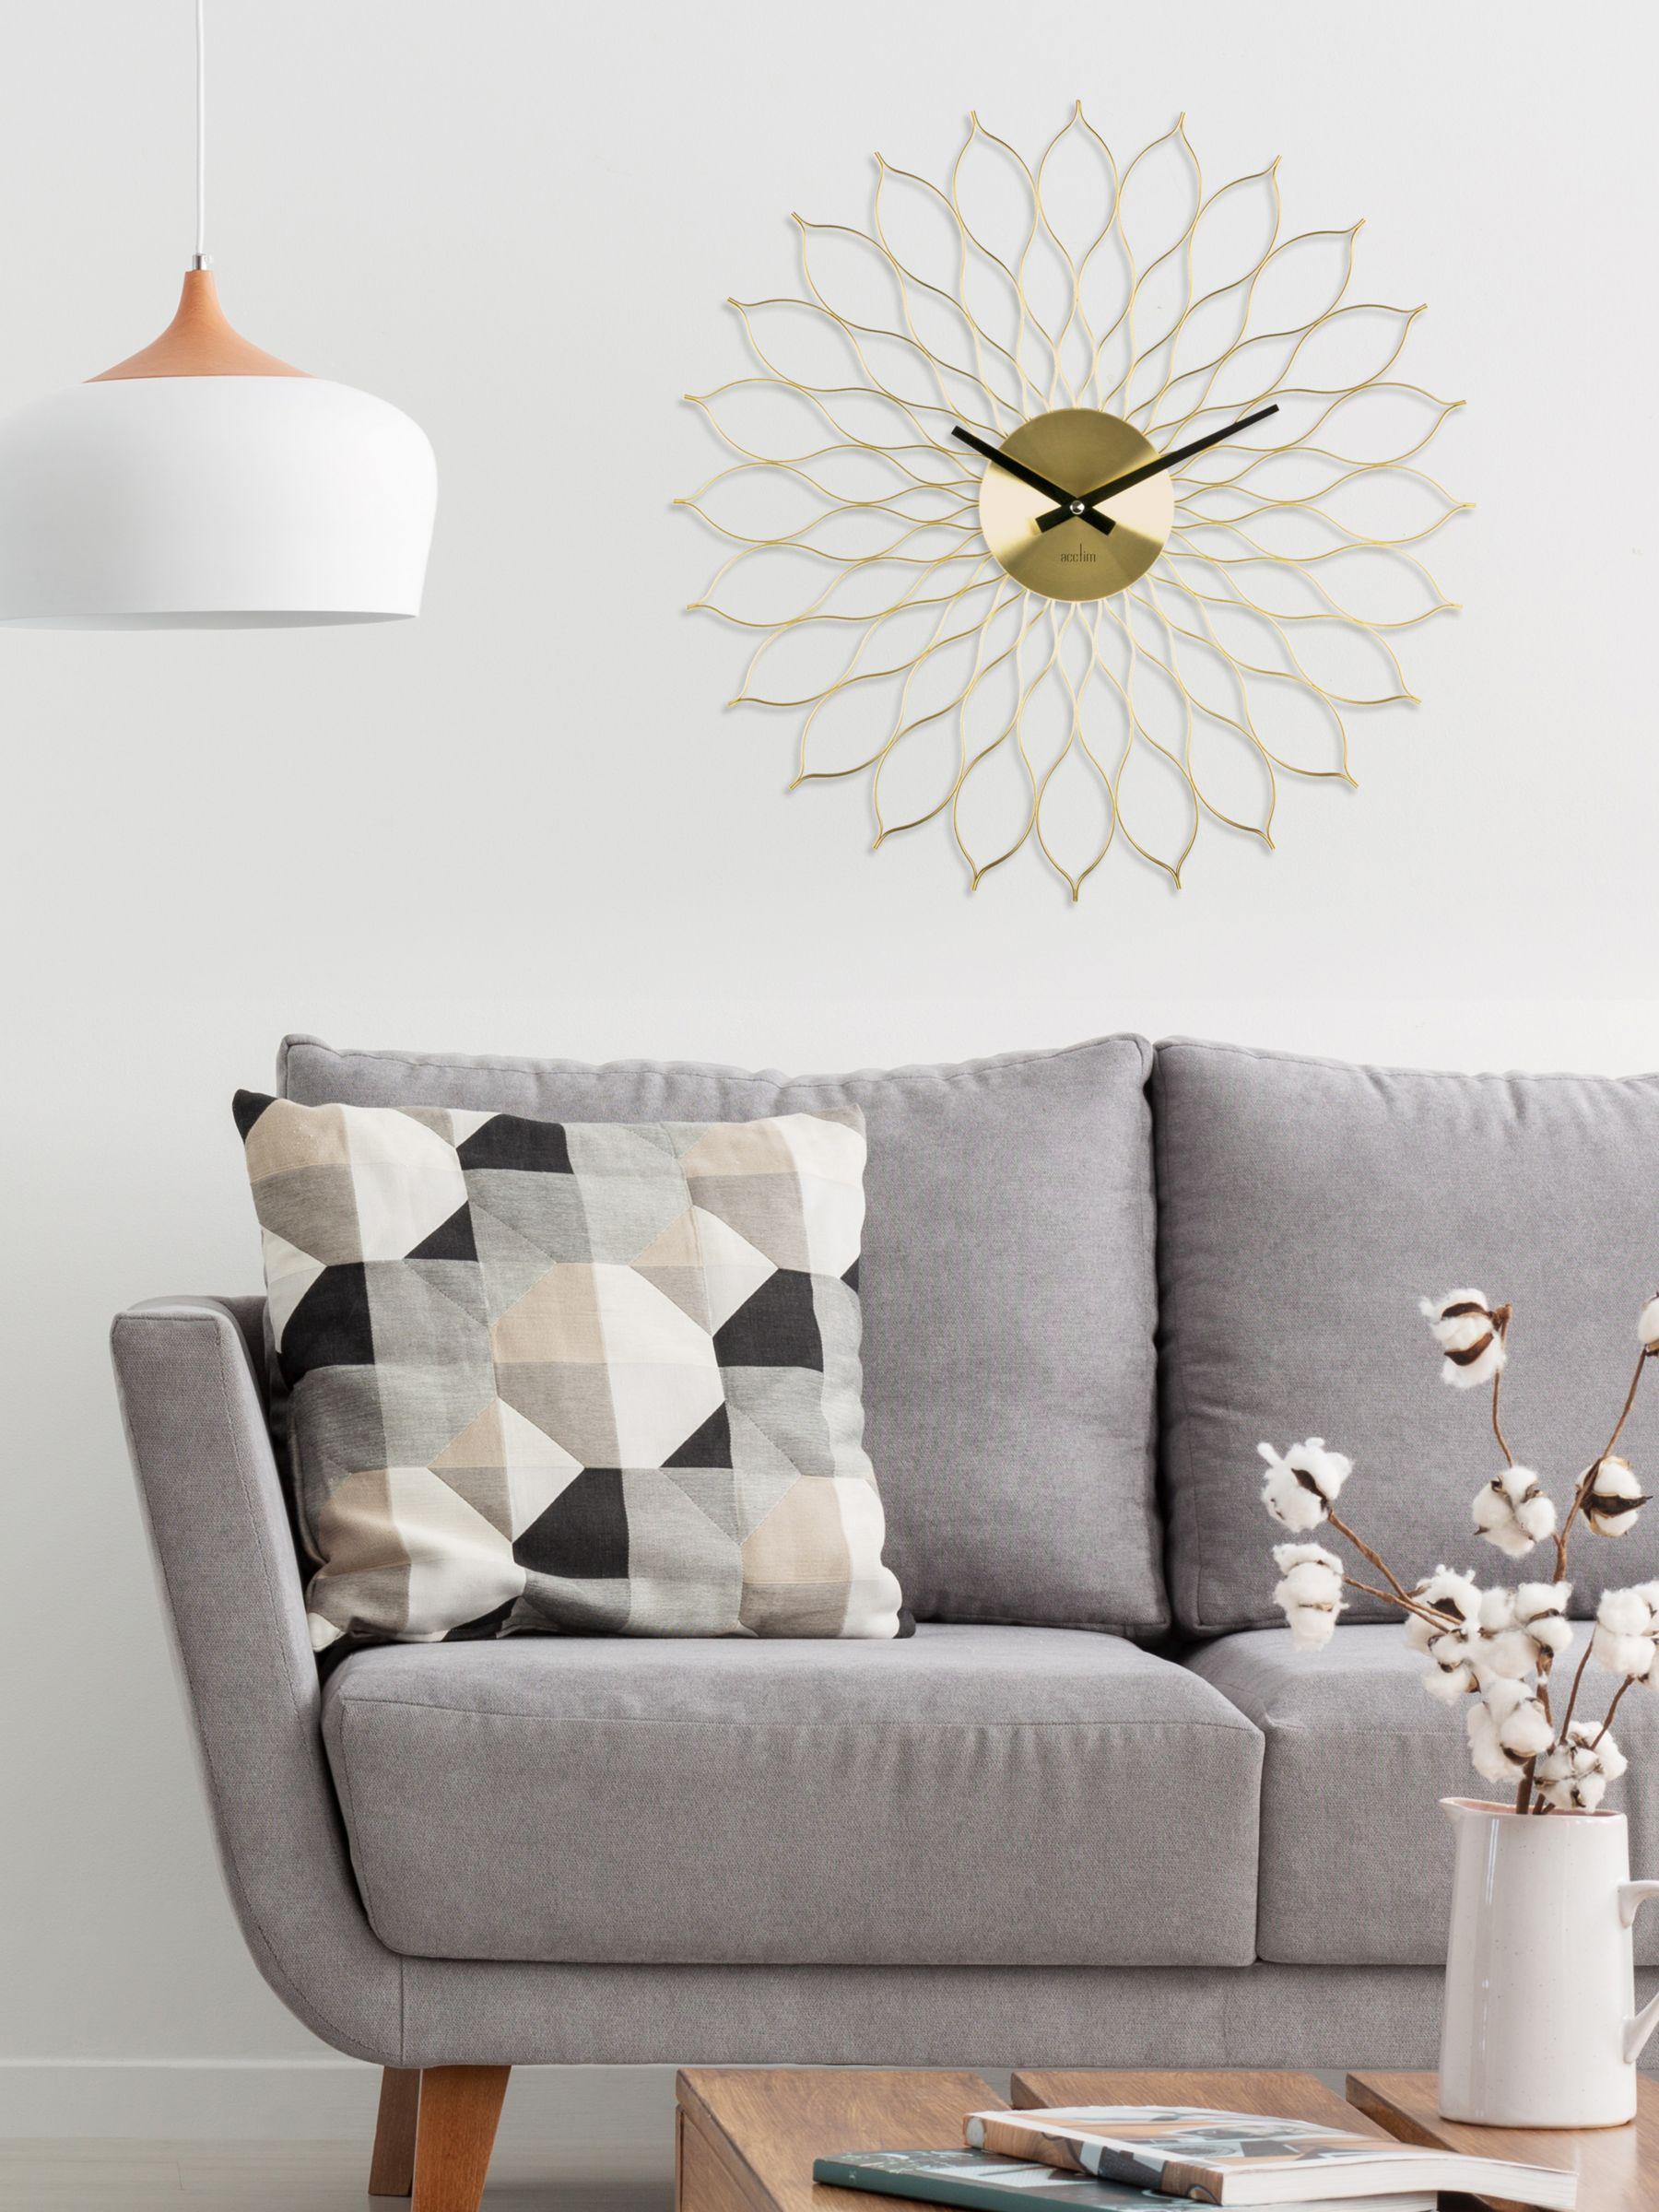 Acctim Acctim Helios Quartz Wall Clock, 49cm, Brass